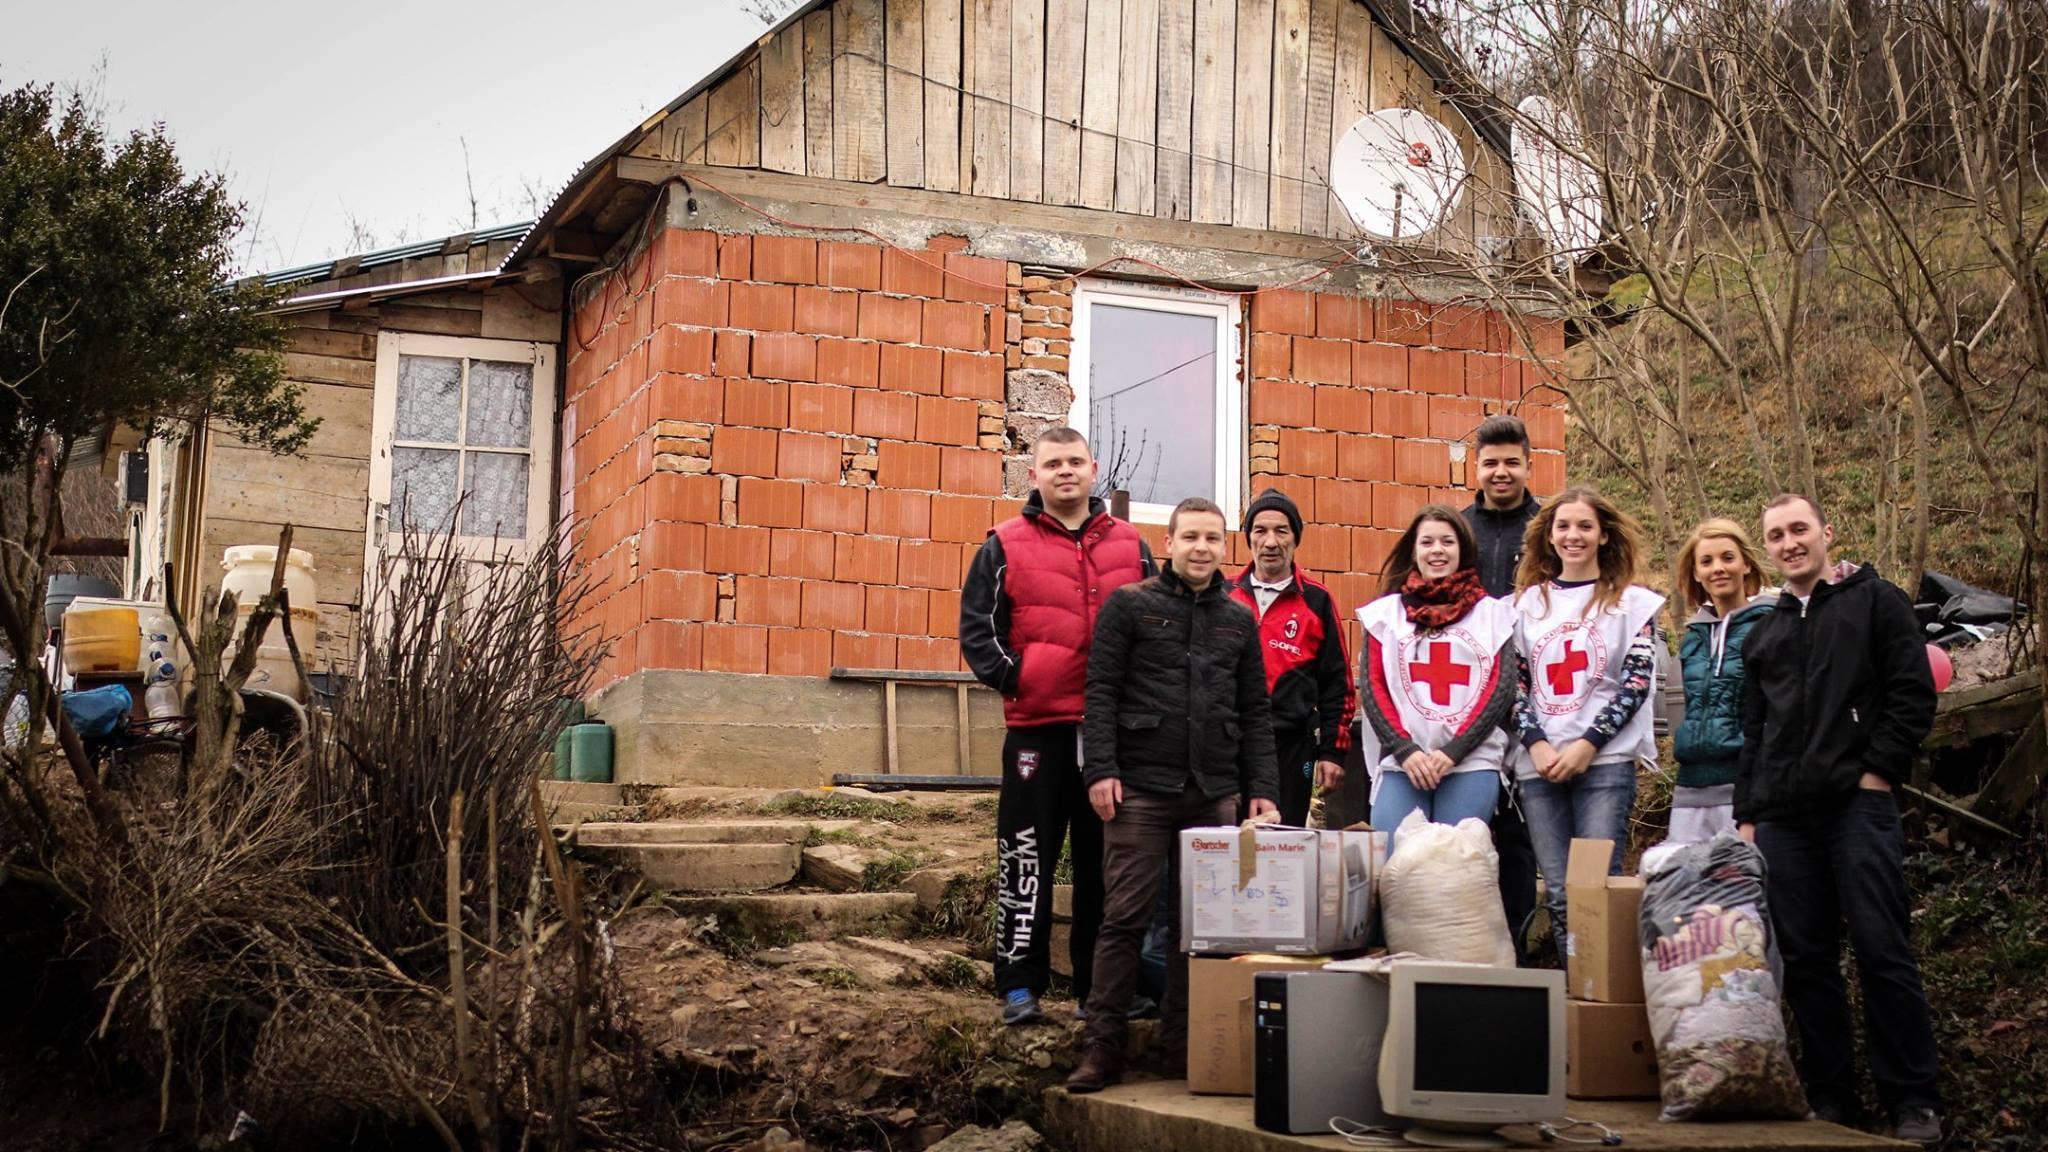 Reprezentatntii Crucea Rosie Lipova au vizitat la domiciliu familiile nevoiase si le-au donat diverse ajutoare colectate